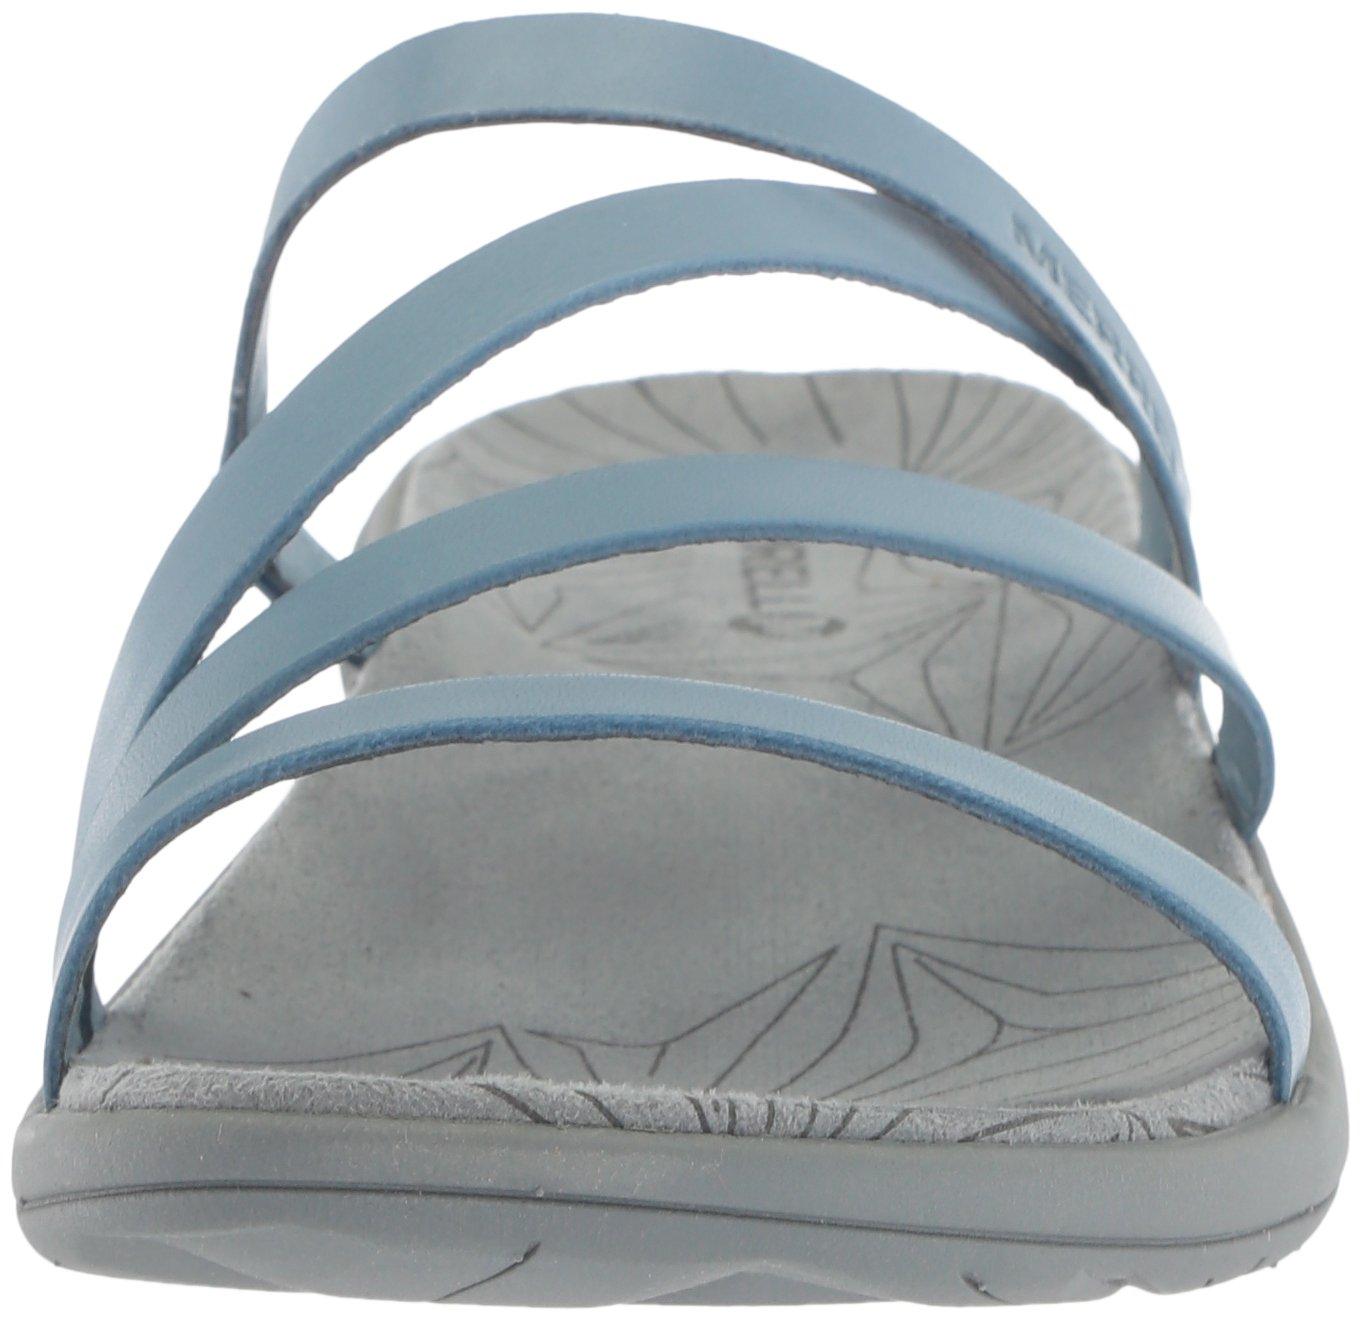 Merrell Women's Duskair Seaway Leather Slide Sandal B072M2VZT7 5 B(M) US|Blue Heaven